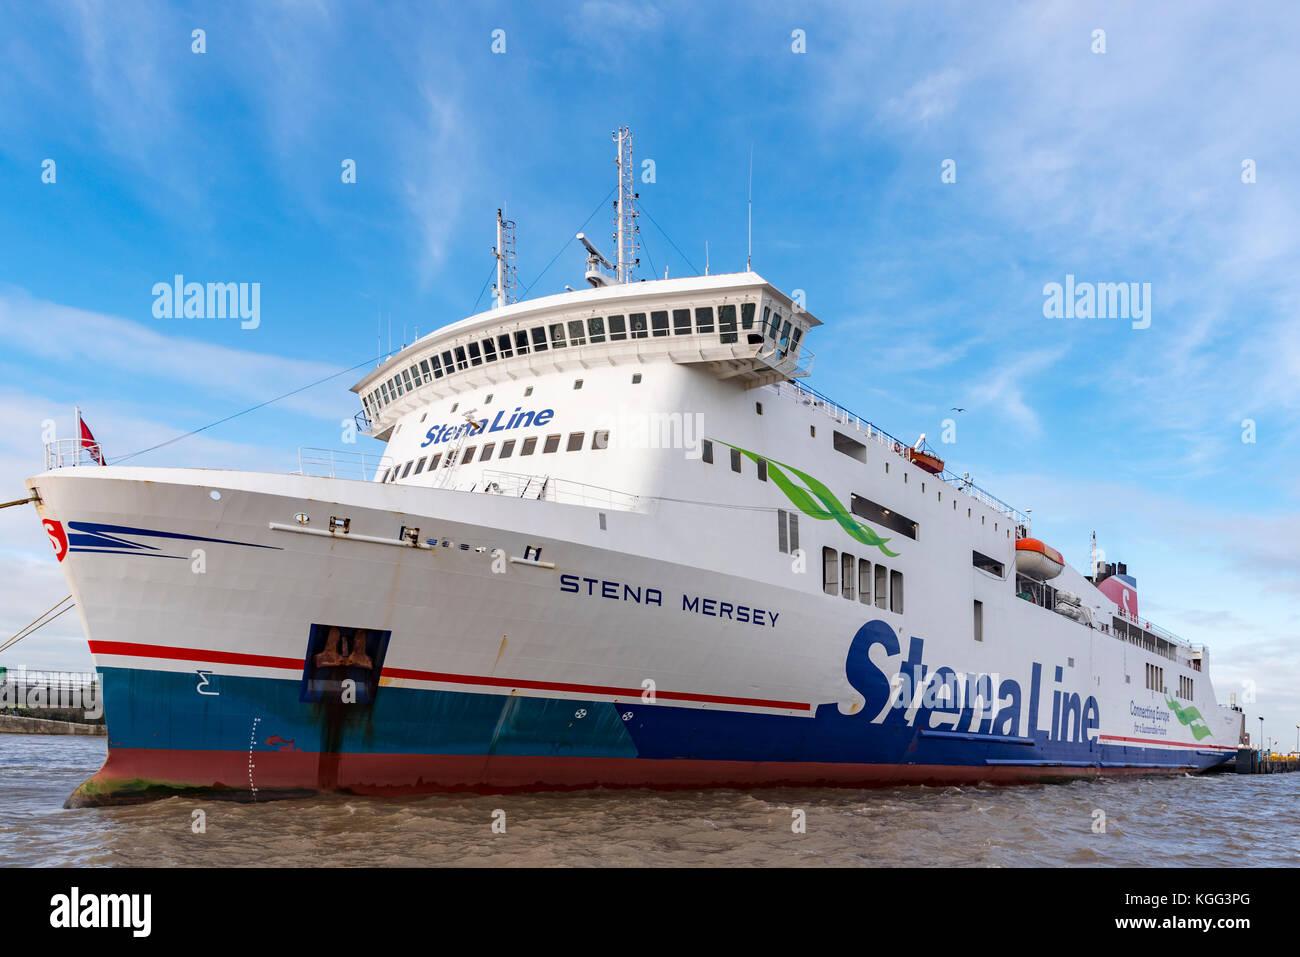 The ro-ro car ferry Stena Merseyat the Twelve Quays terminal in Birkenhead. - Stock Image